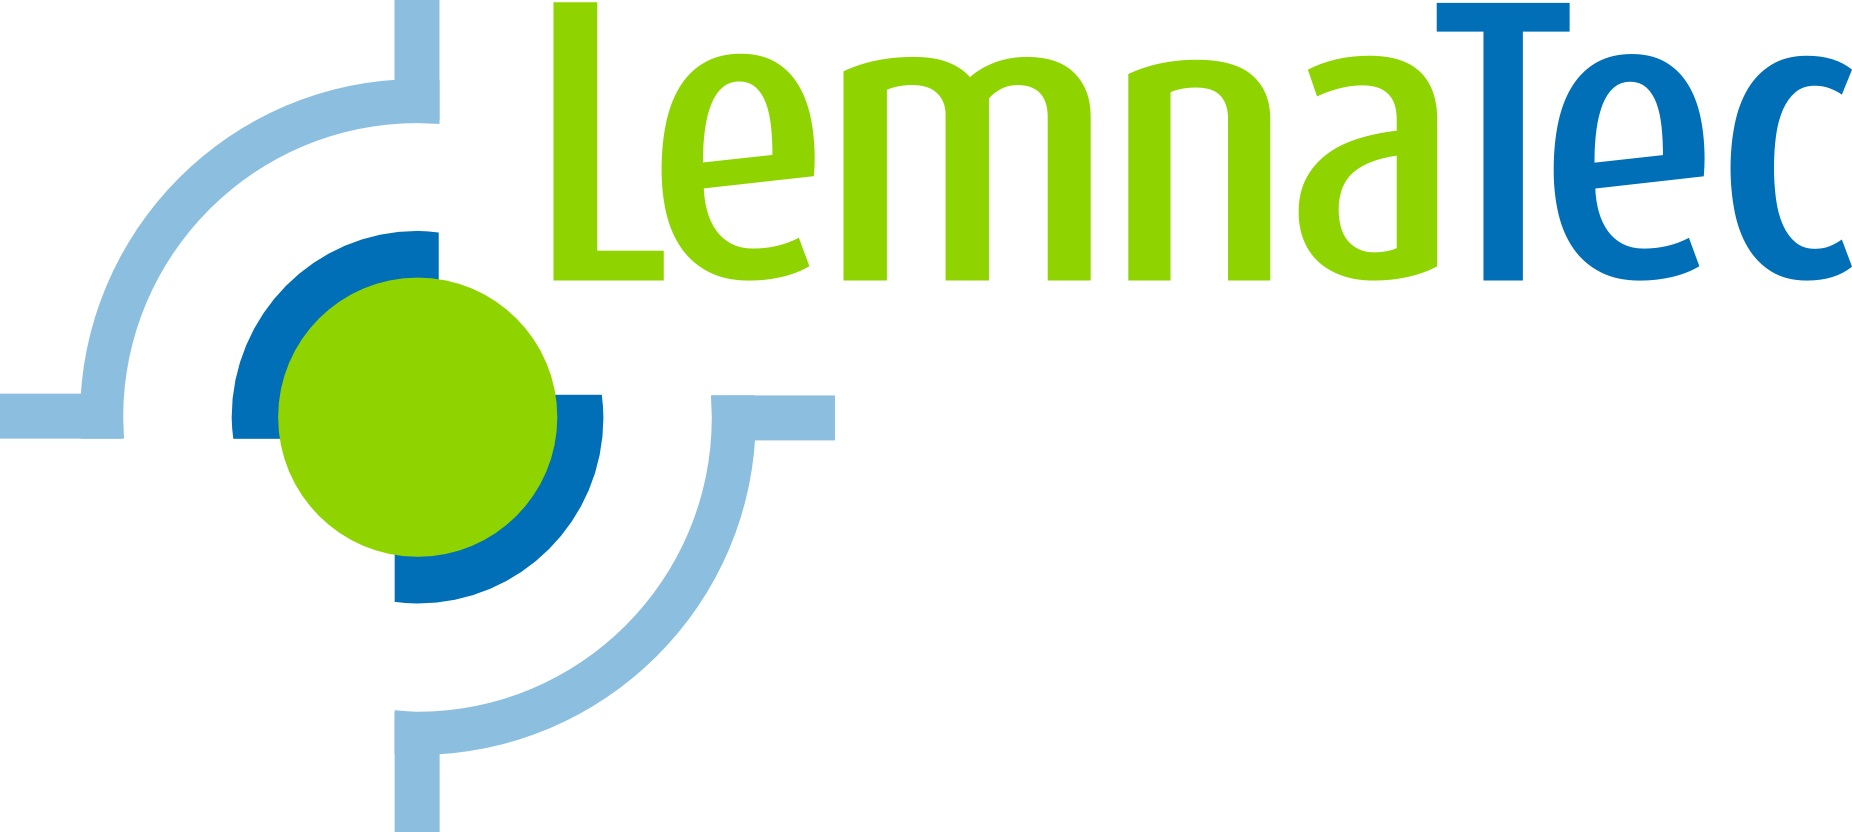 Lemnatec-1